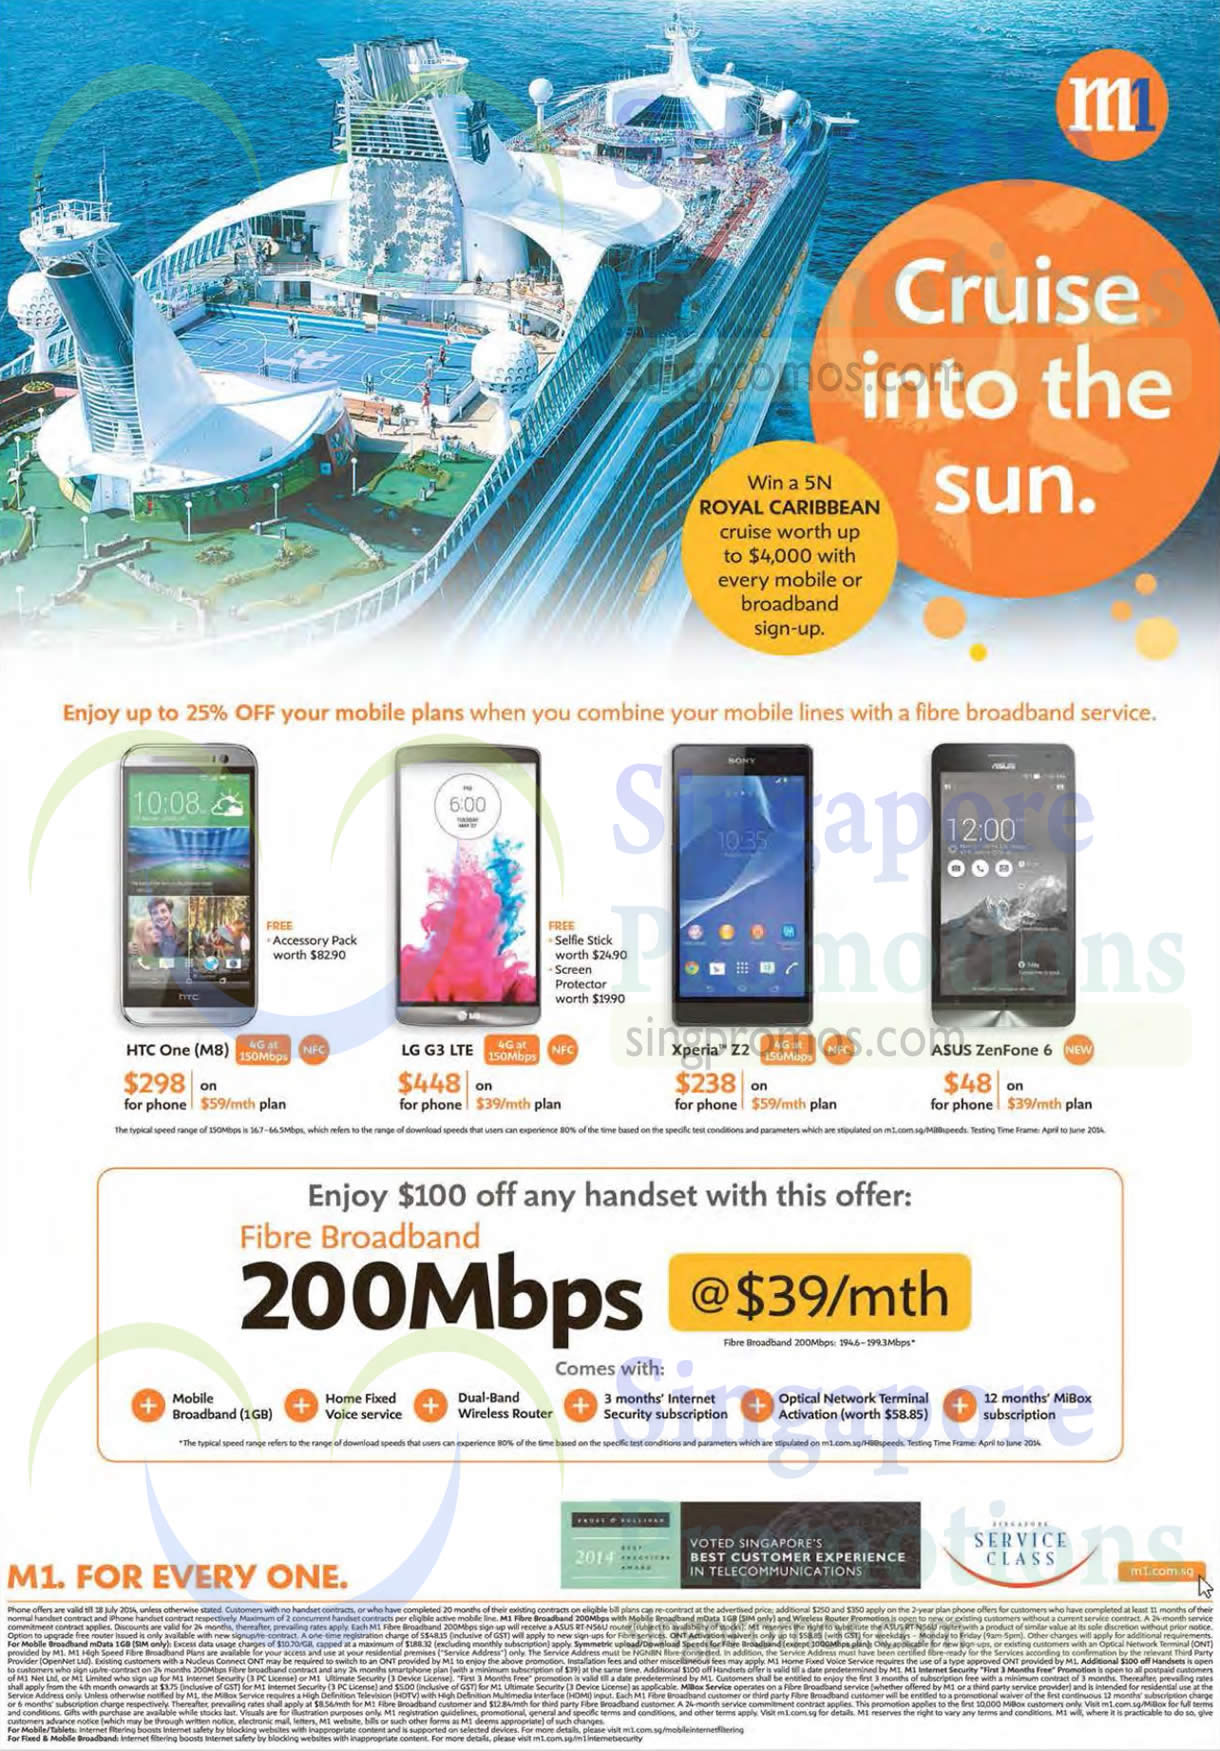 Fibre Broadband 39.00 200Mbps, HTC One M8, LG G3, Sony Xperia Z2, Asus Zenfone 6